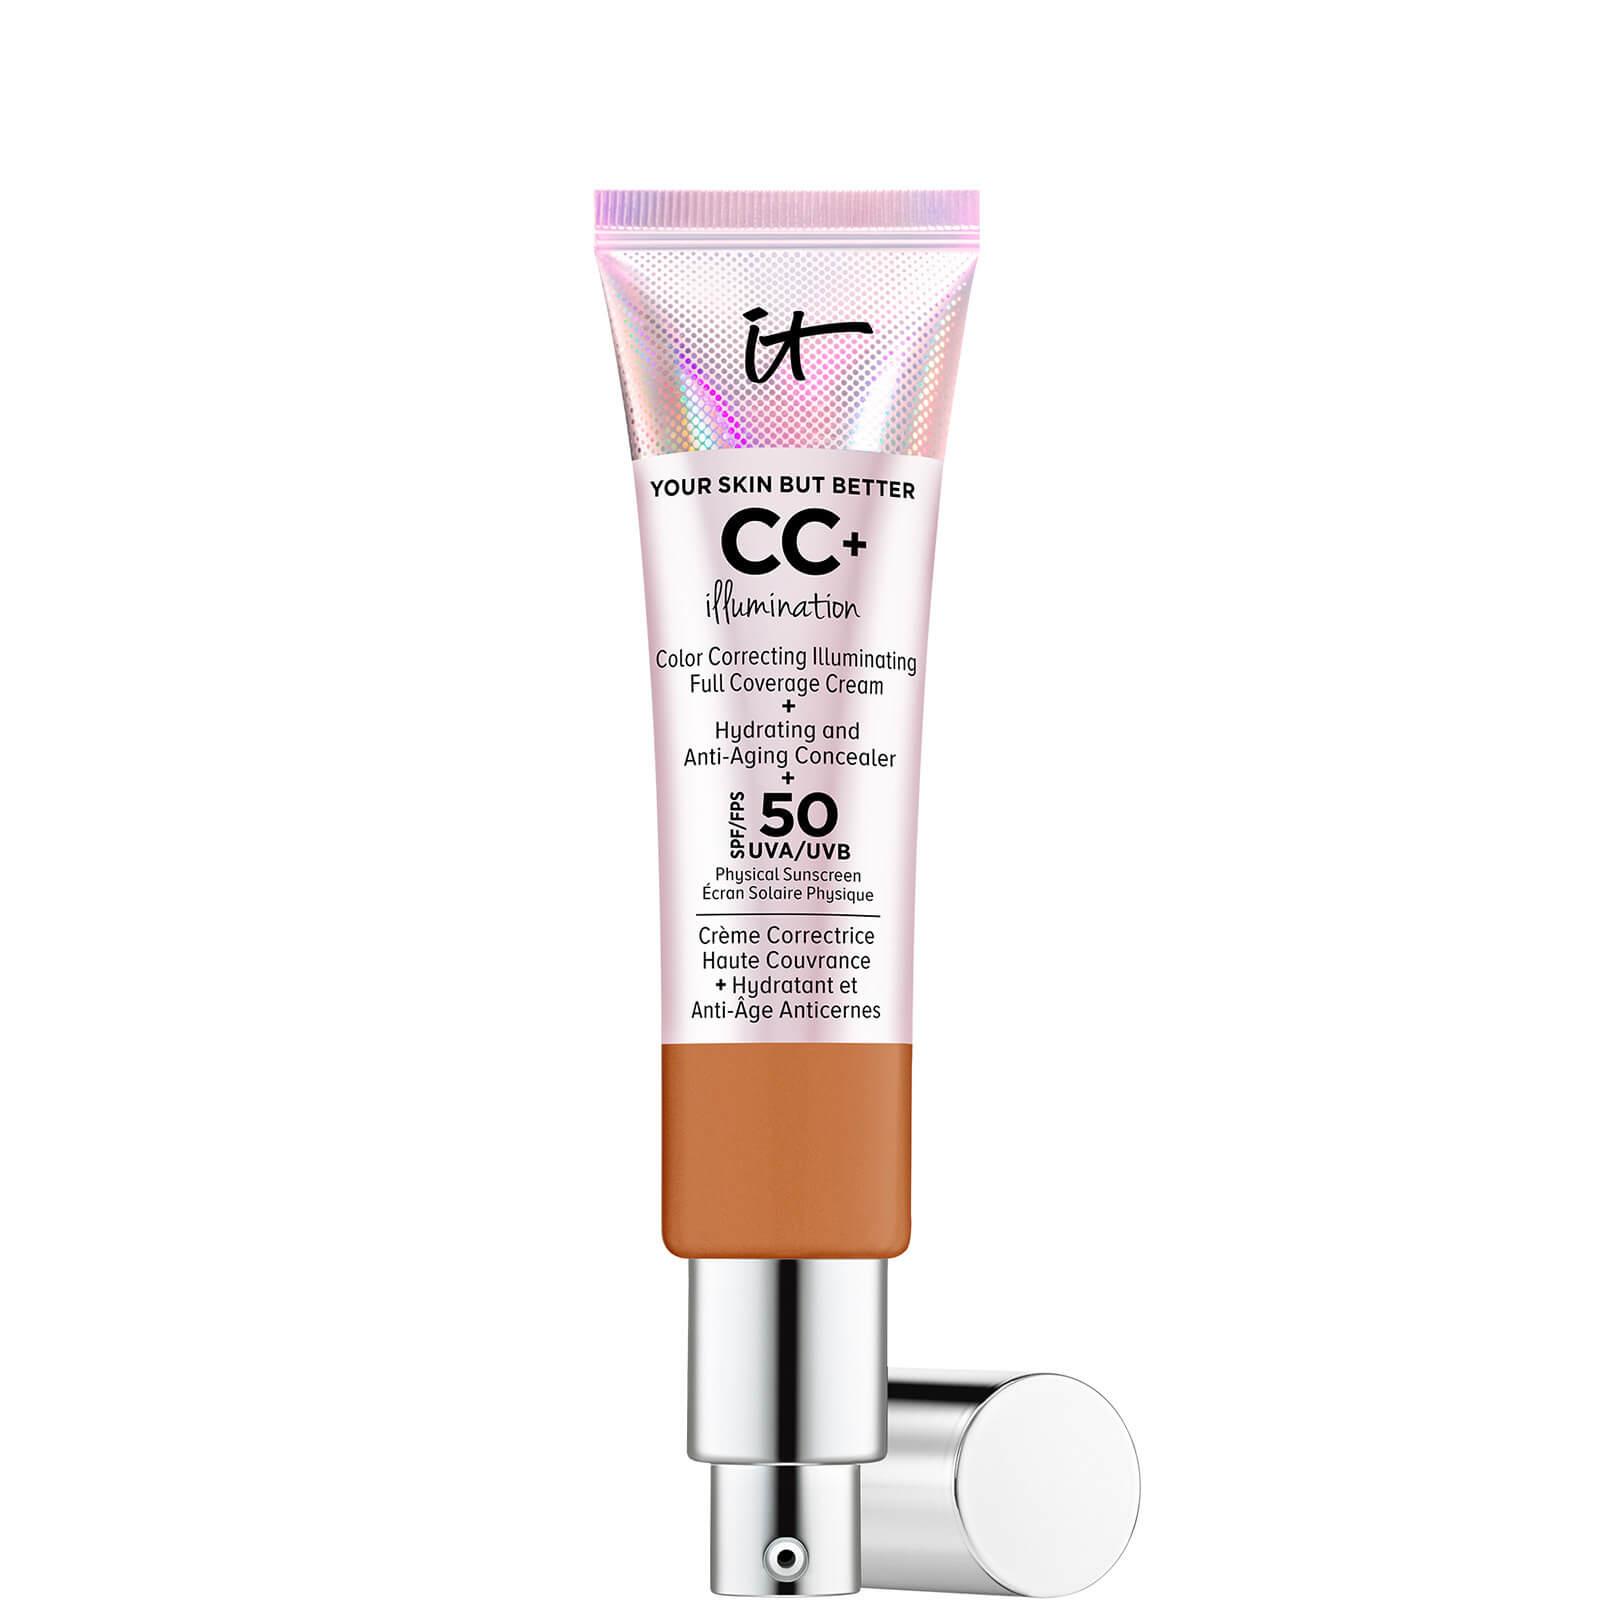 Купить IT Cosmetics Your Skin But Better CC+ Illumination SPF50 32ml (Various Shades) - Rich